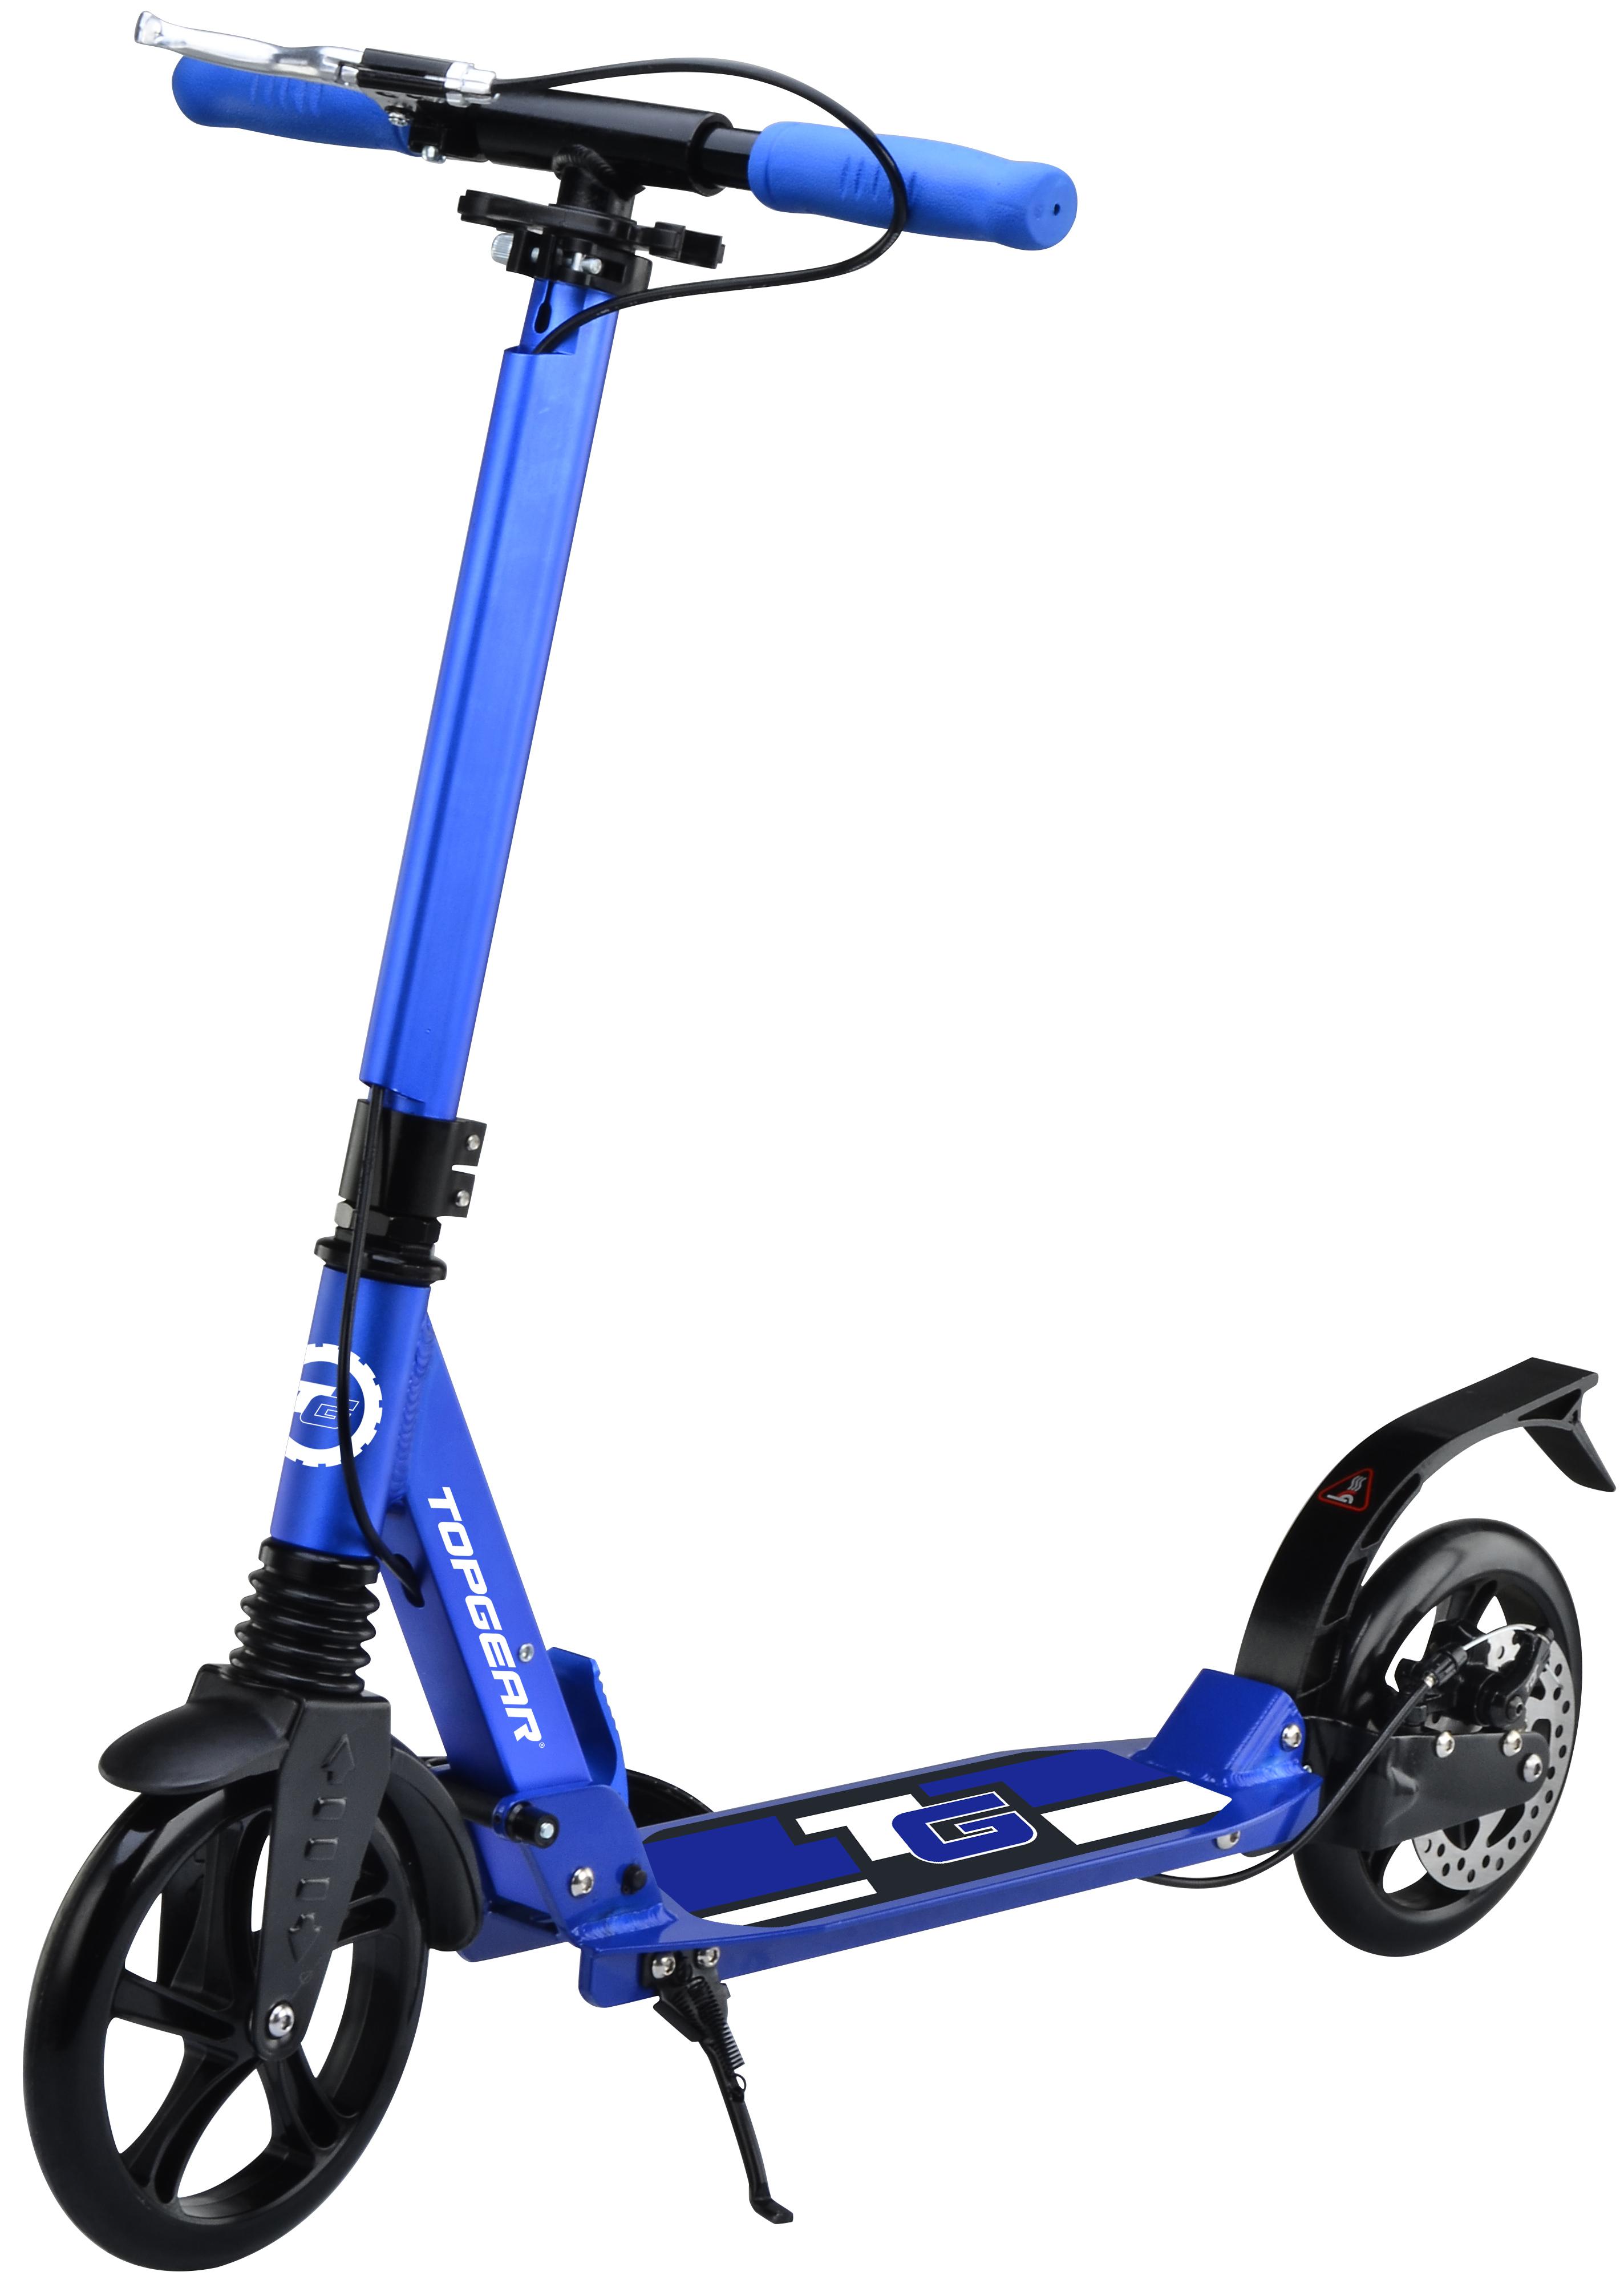 самокат TopGear TG 200 мм синий самокат top gear eco viii 200 мм голубой